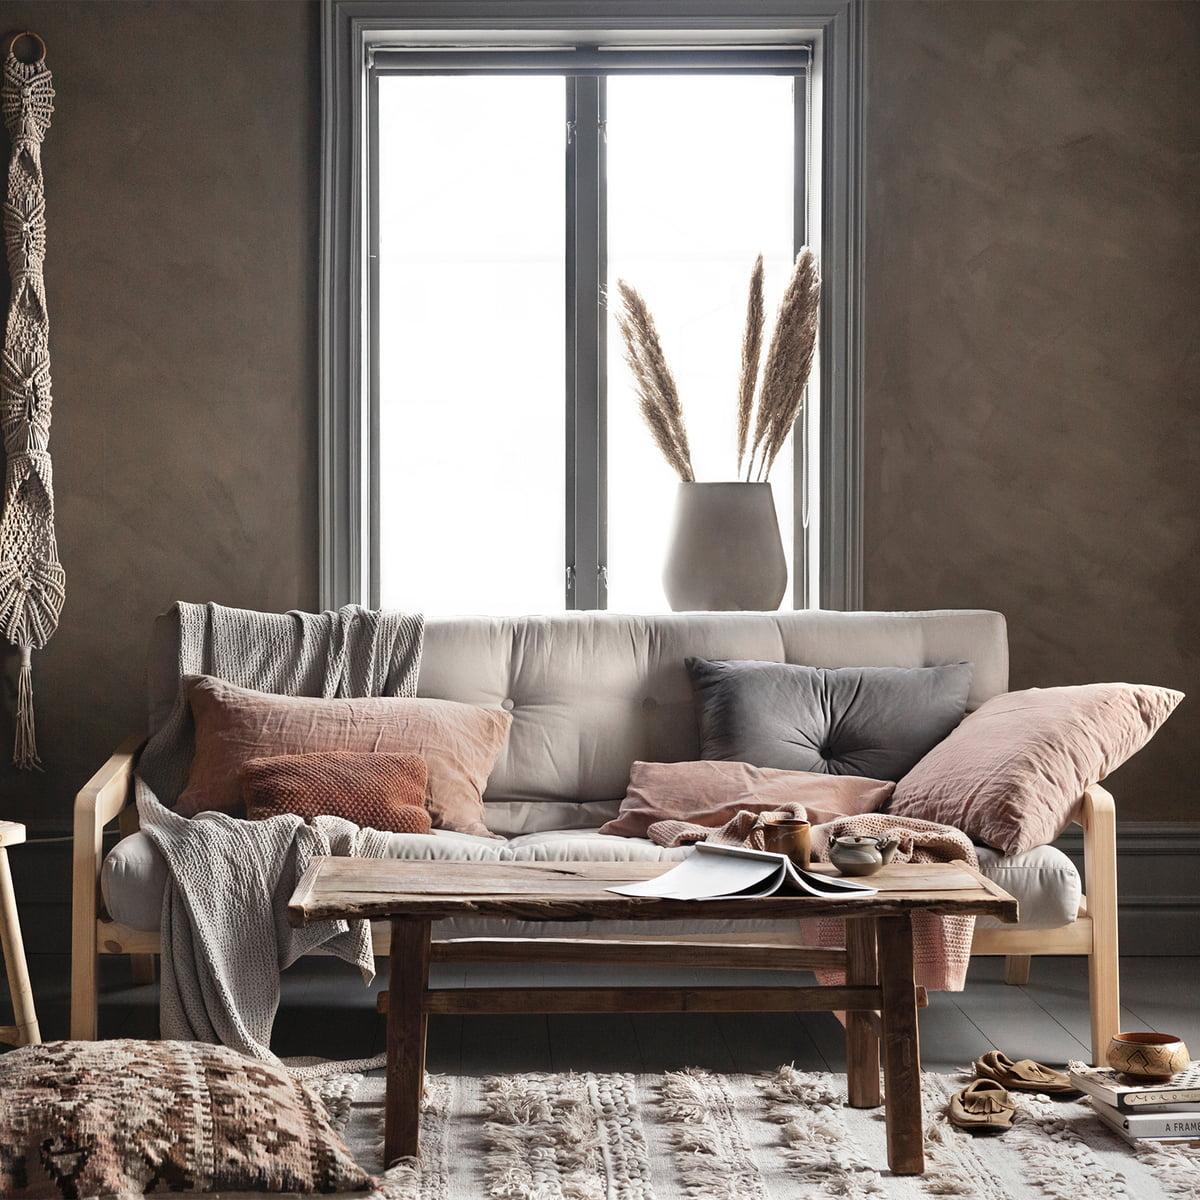 Karup Design - Grave sofa, natural / grey (746)